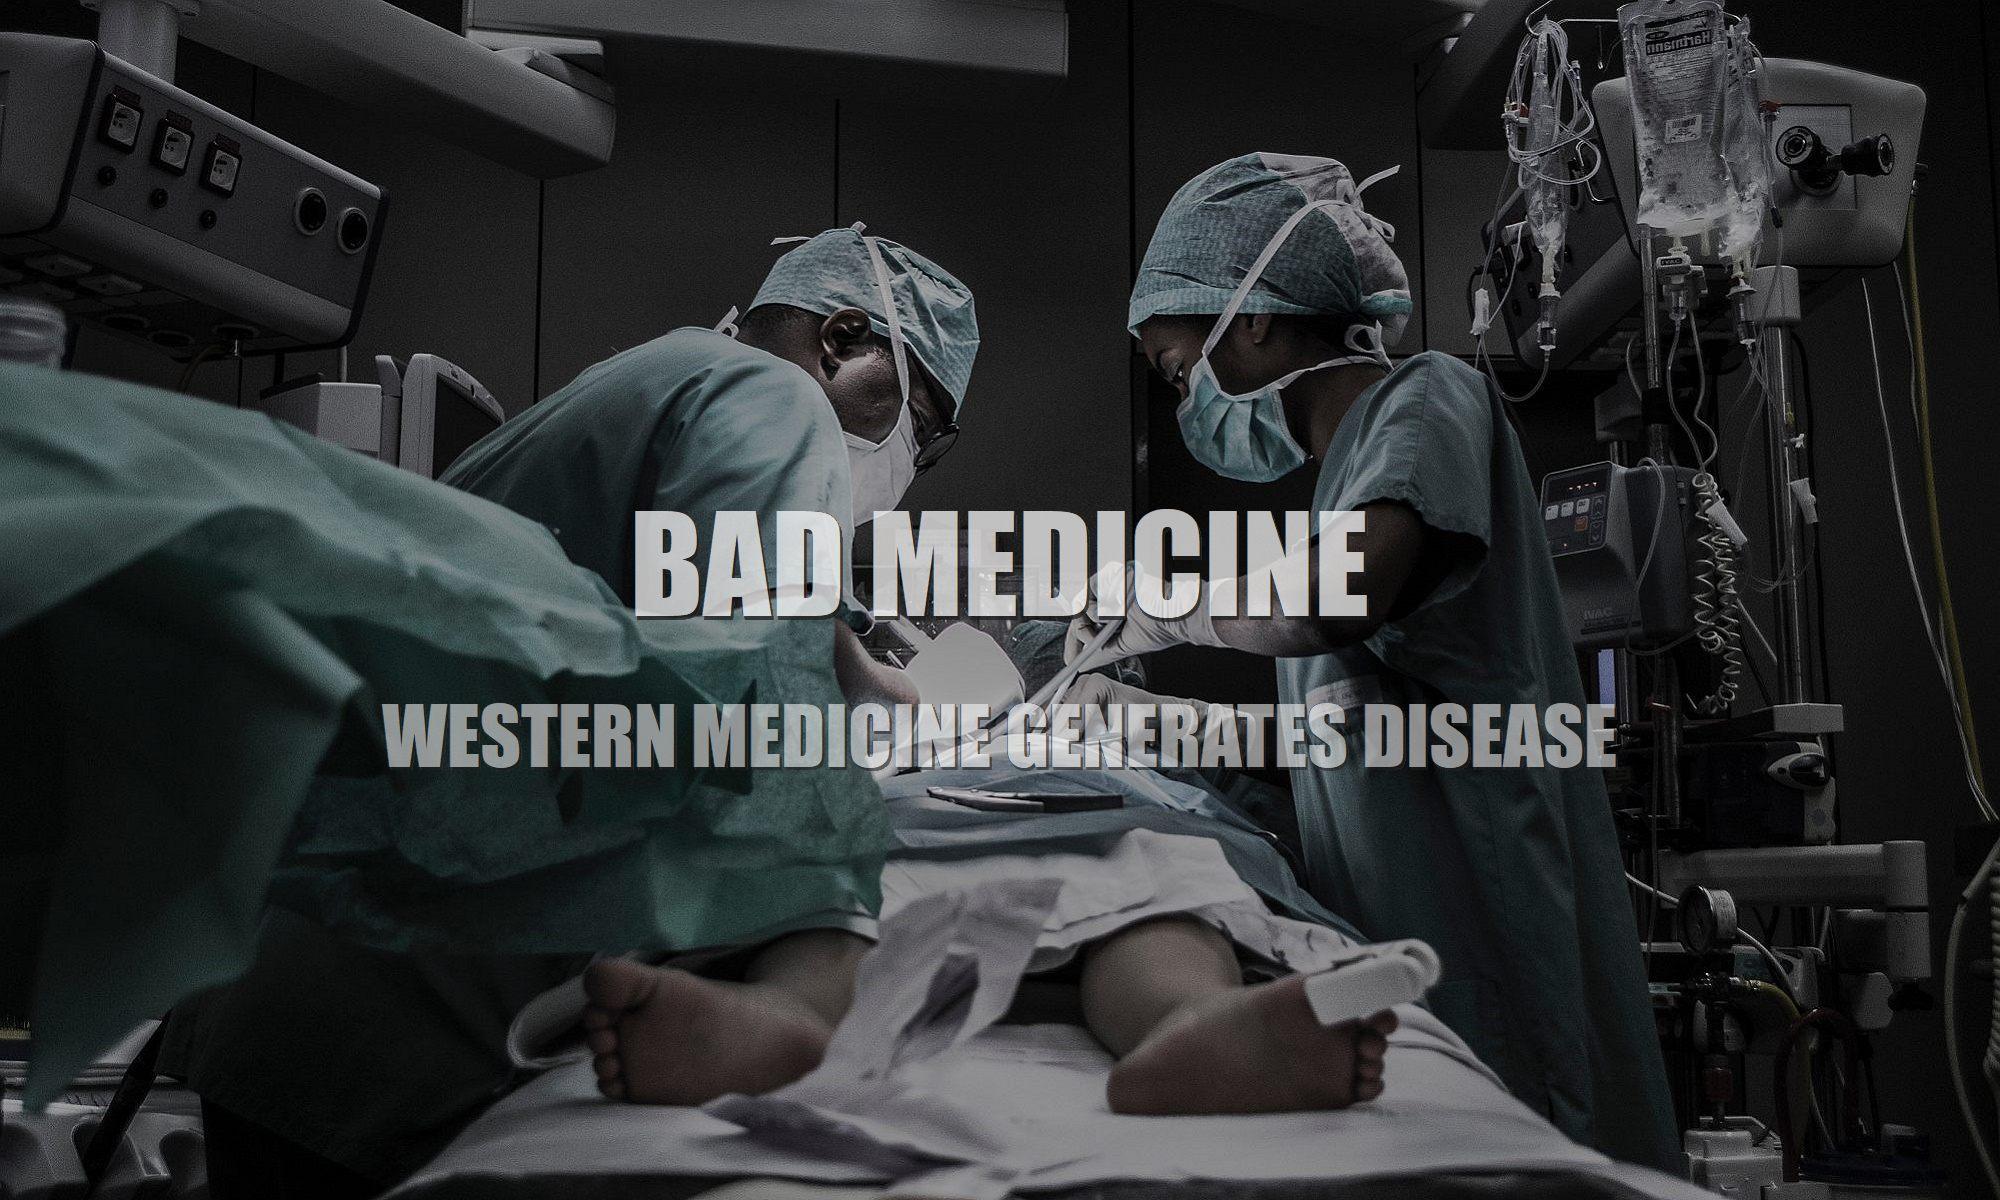 Western-medicine-generates-disease-1a-2000